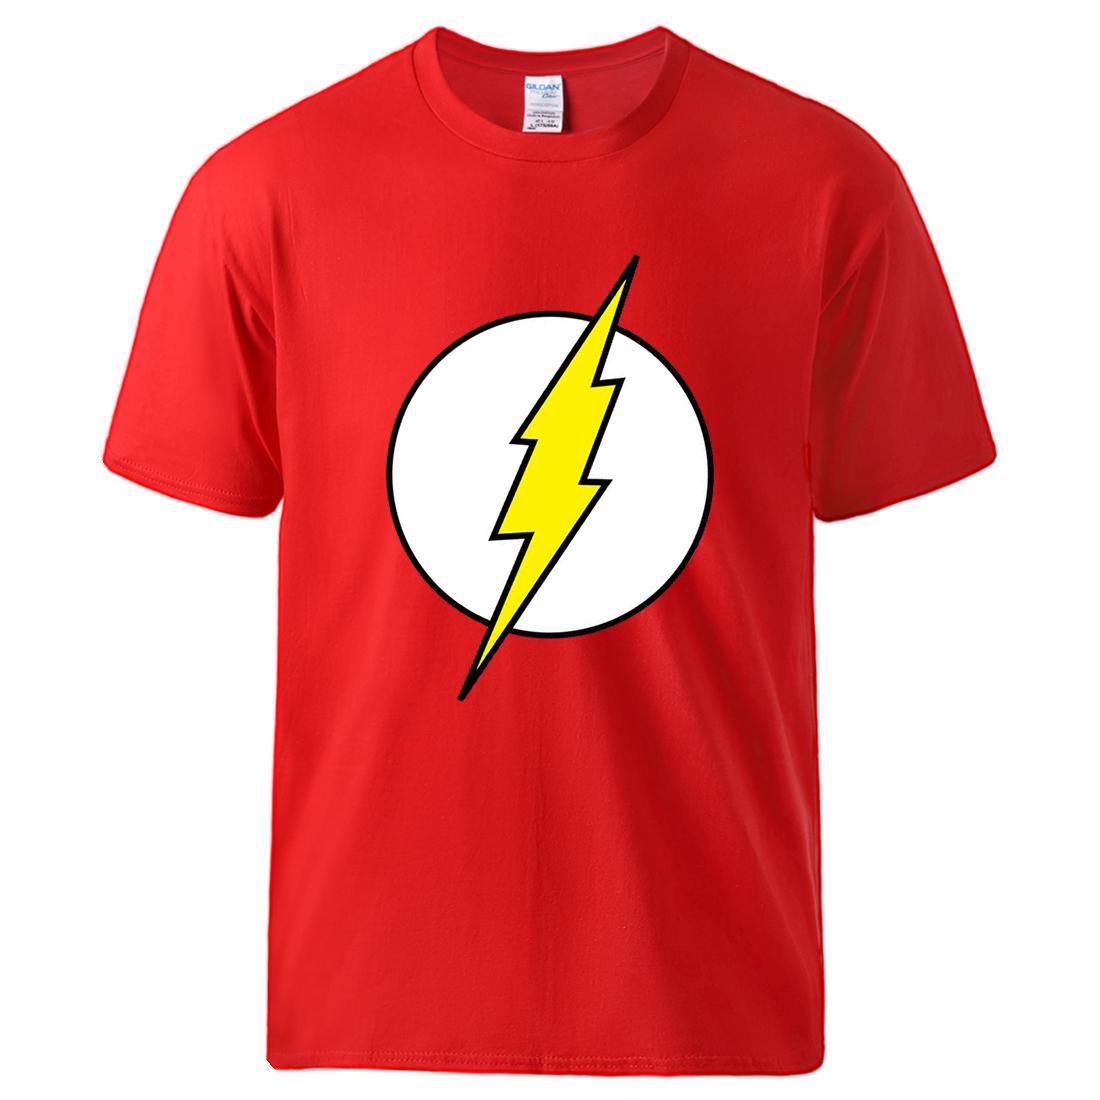 The Big Bang Theory Flash Print Mens T shirts Cotton Summer Short Sleeve Top 2020 Man Brand Hip Hop Streetwear Homme Black Tee